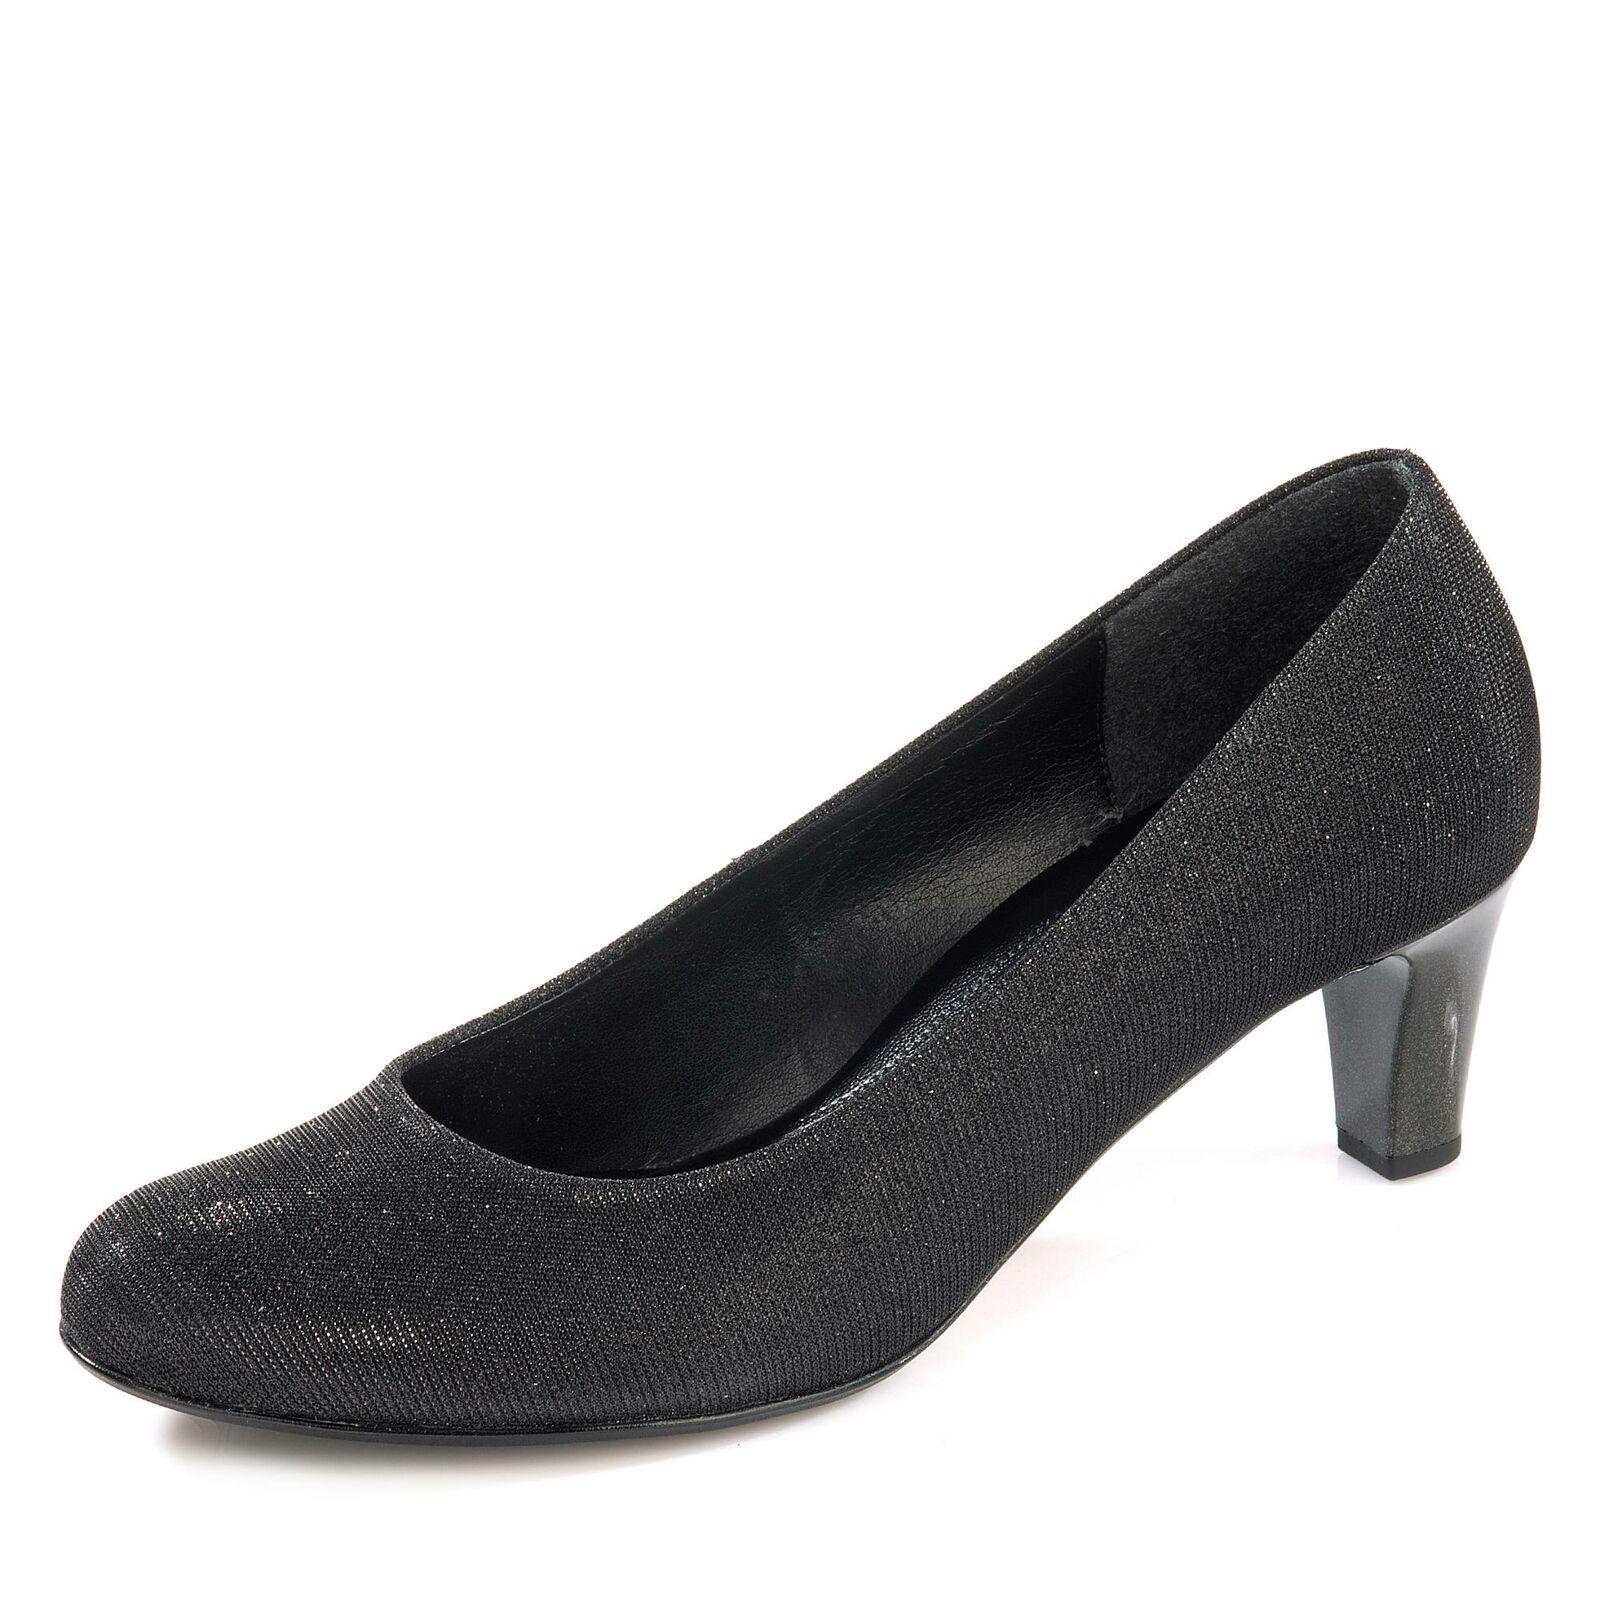 Gabor Damen klassischer Pumps Schlupfschuhe Absatzschuhe Textilmaterial Schuhe